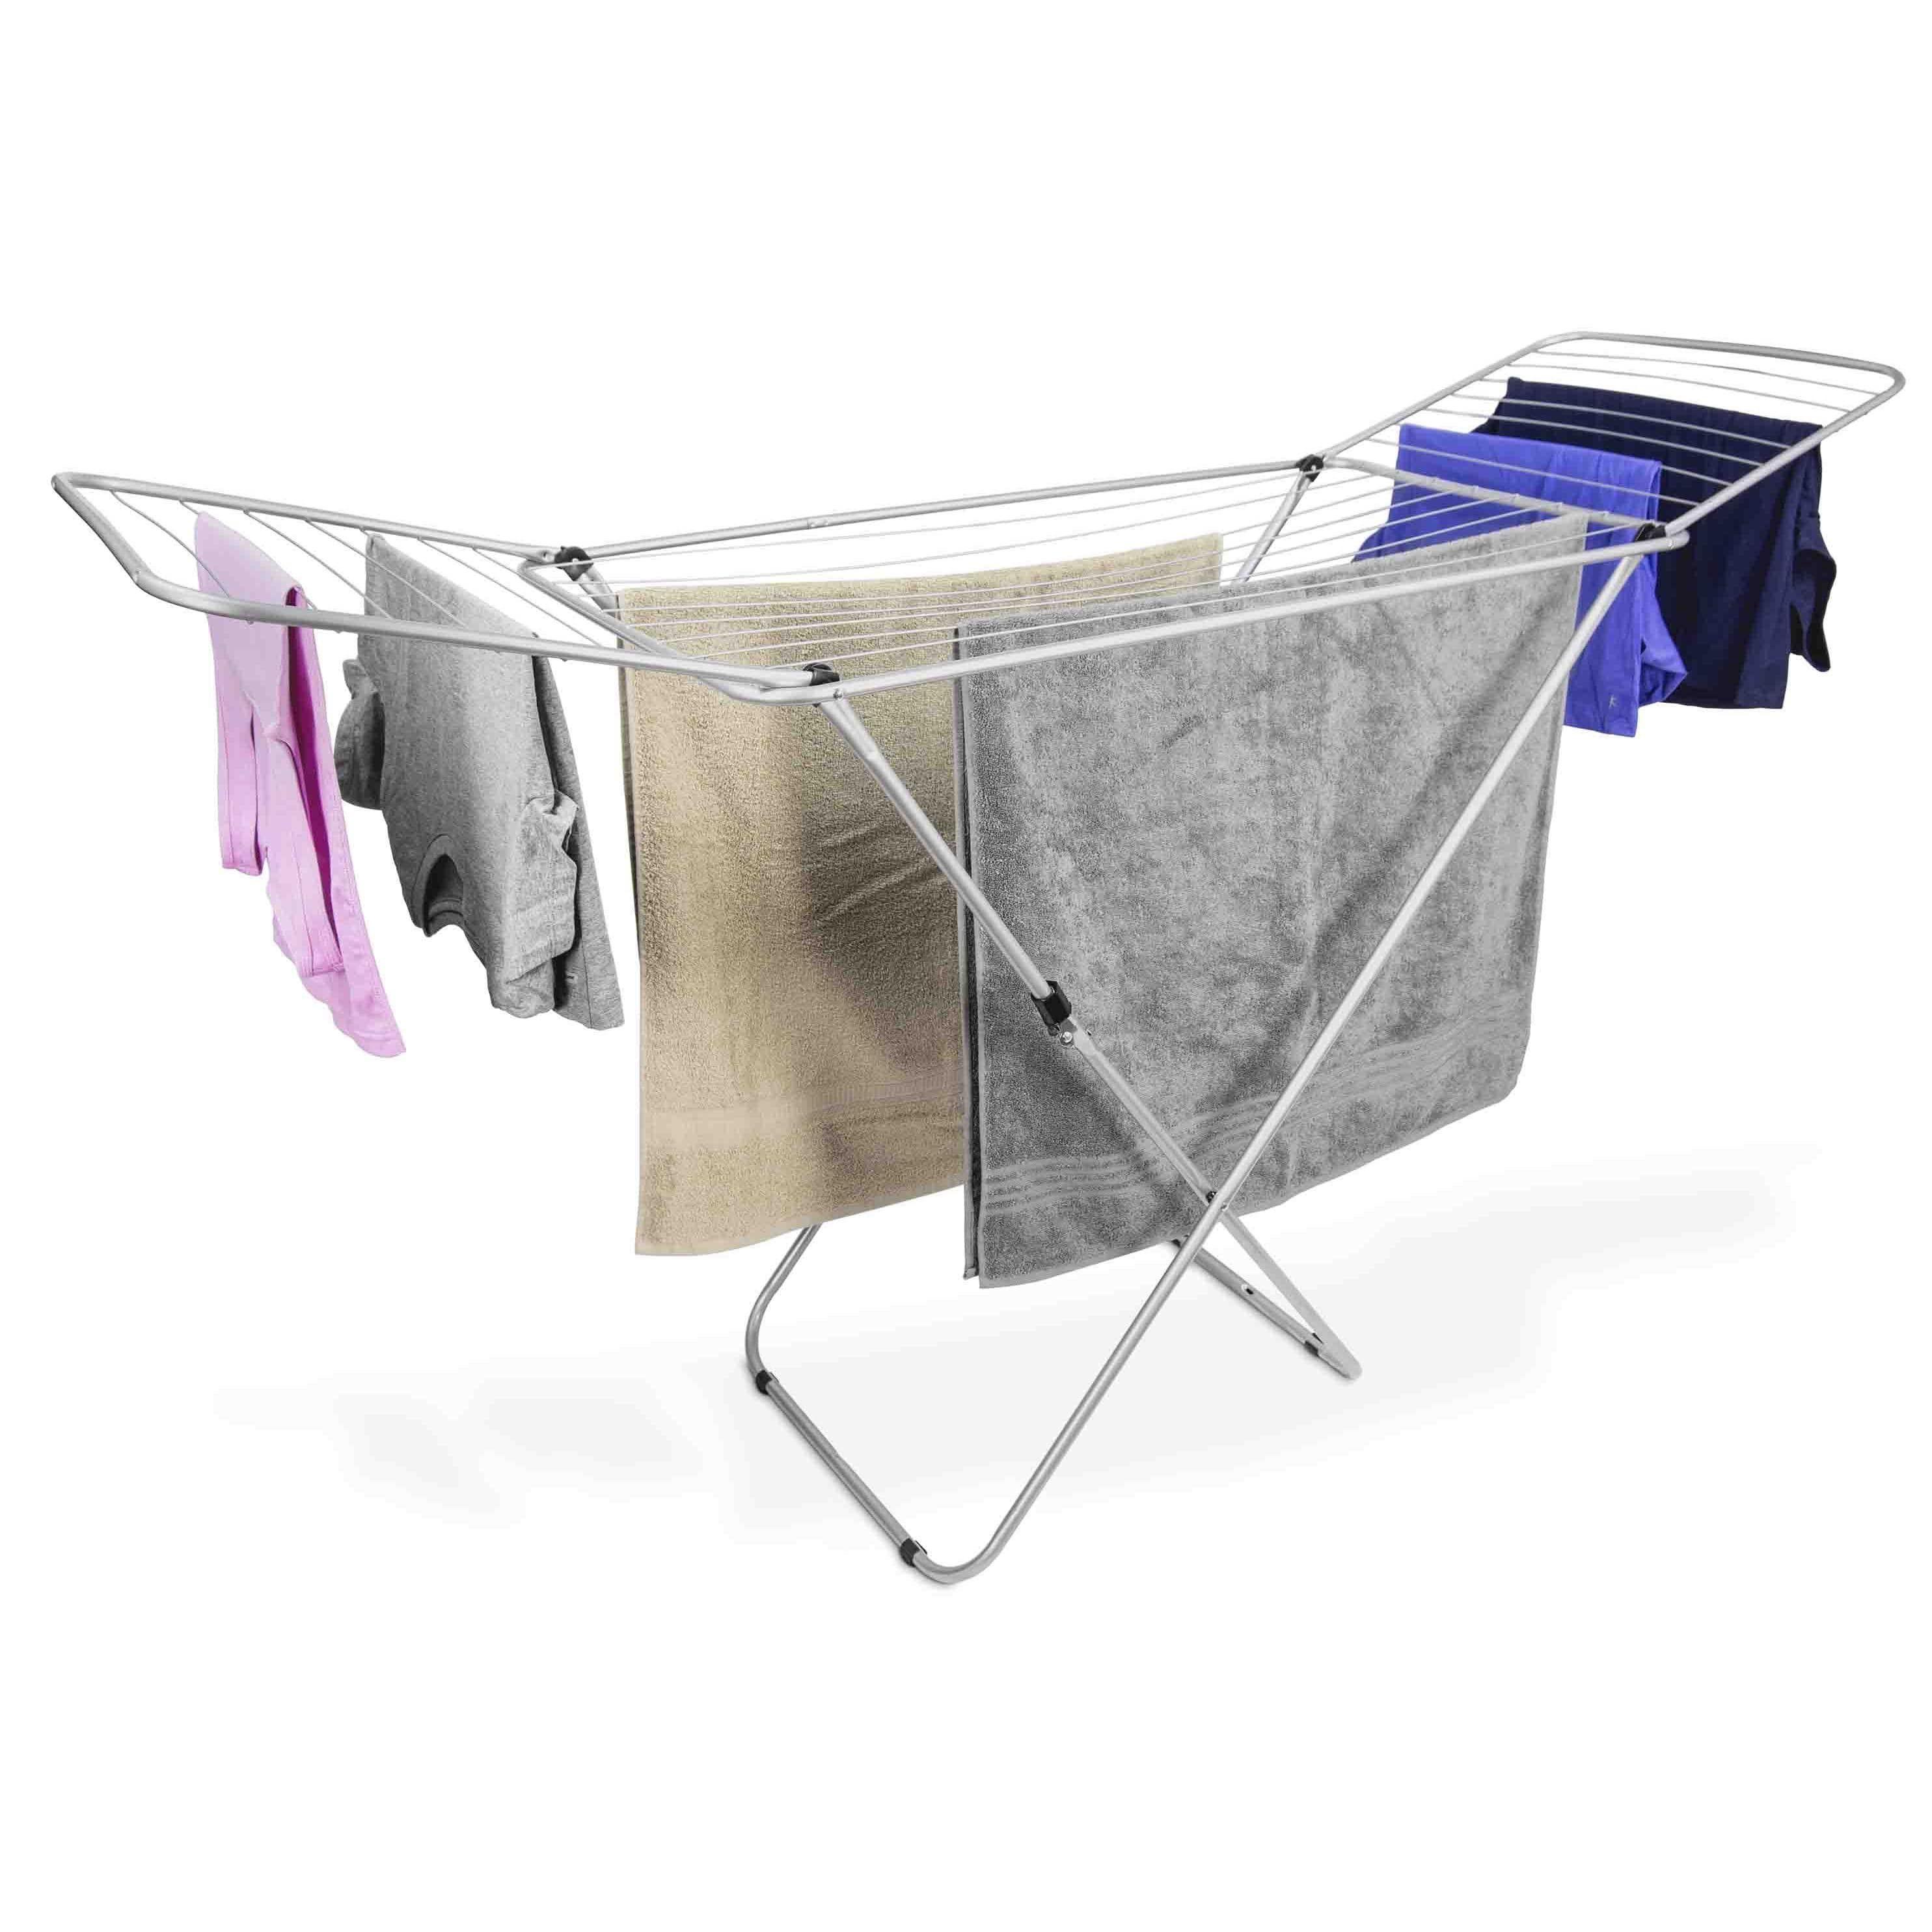 2f8927f2a1f00ec5f4065a7a997bb716 - Better Homes And Gardens Metal Folding Drying Rack